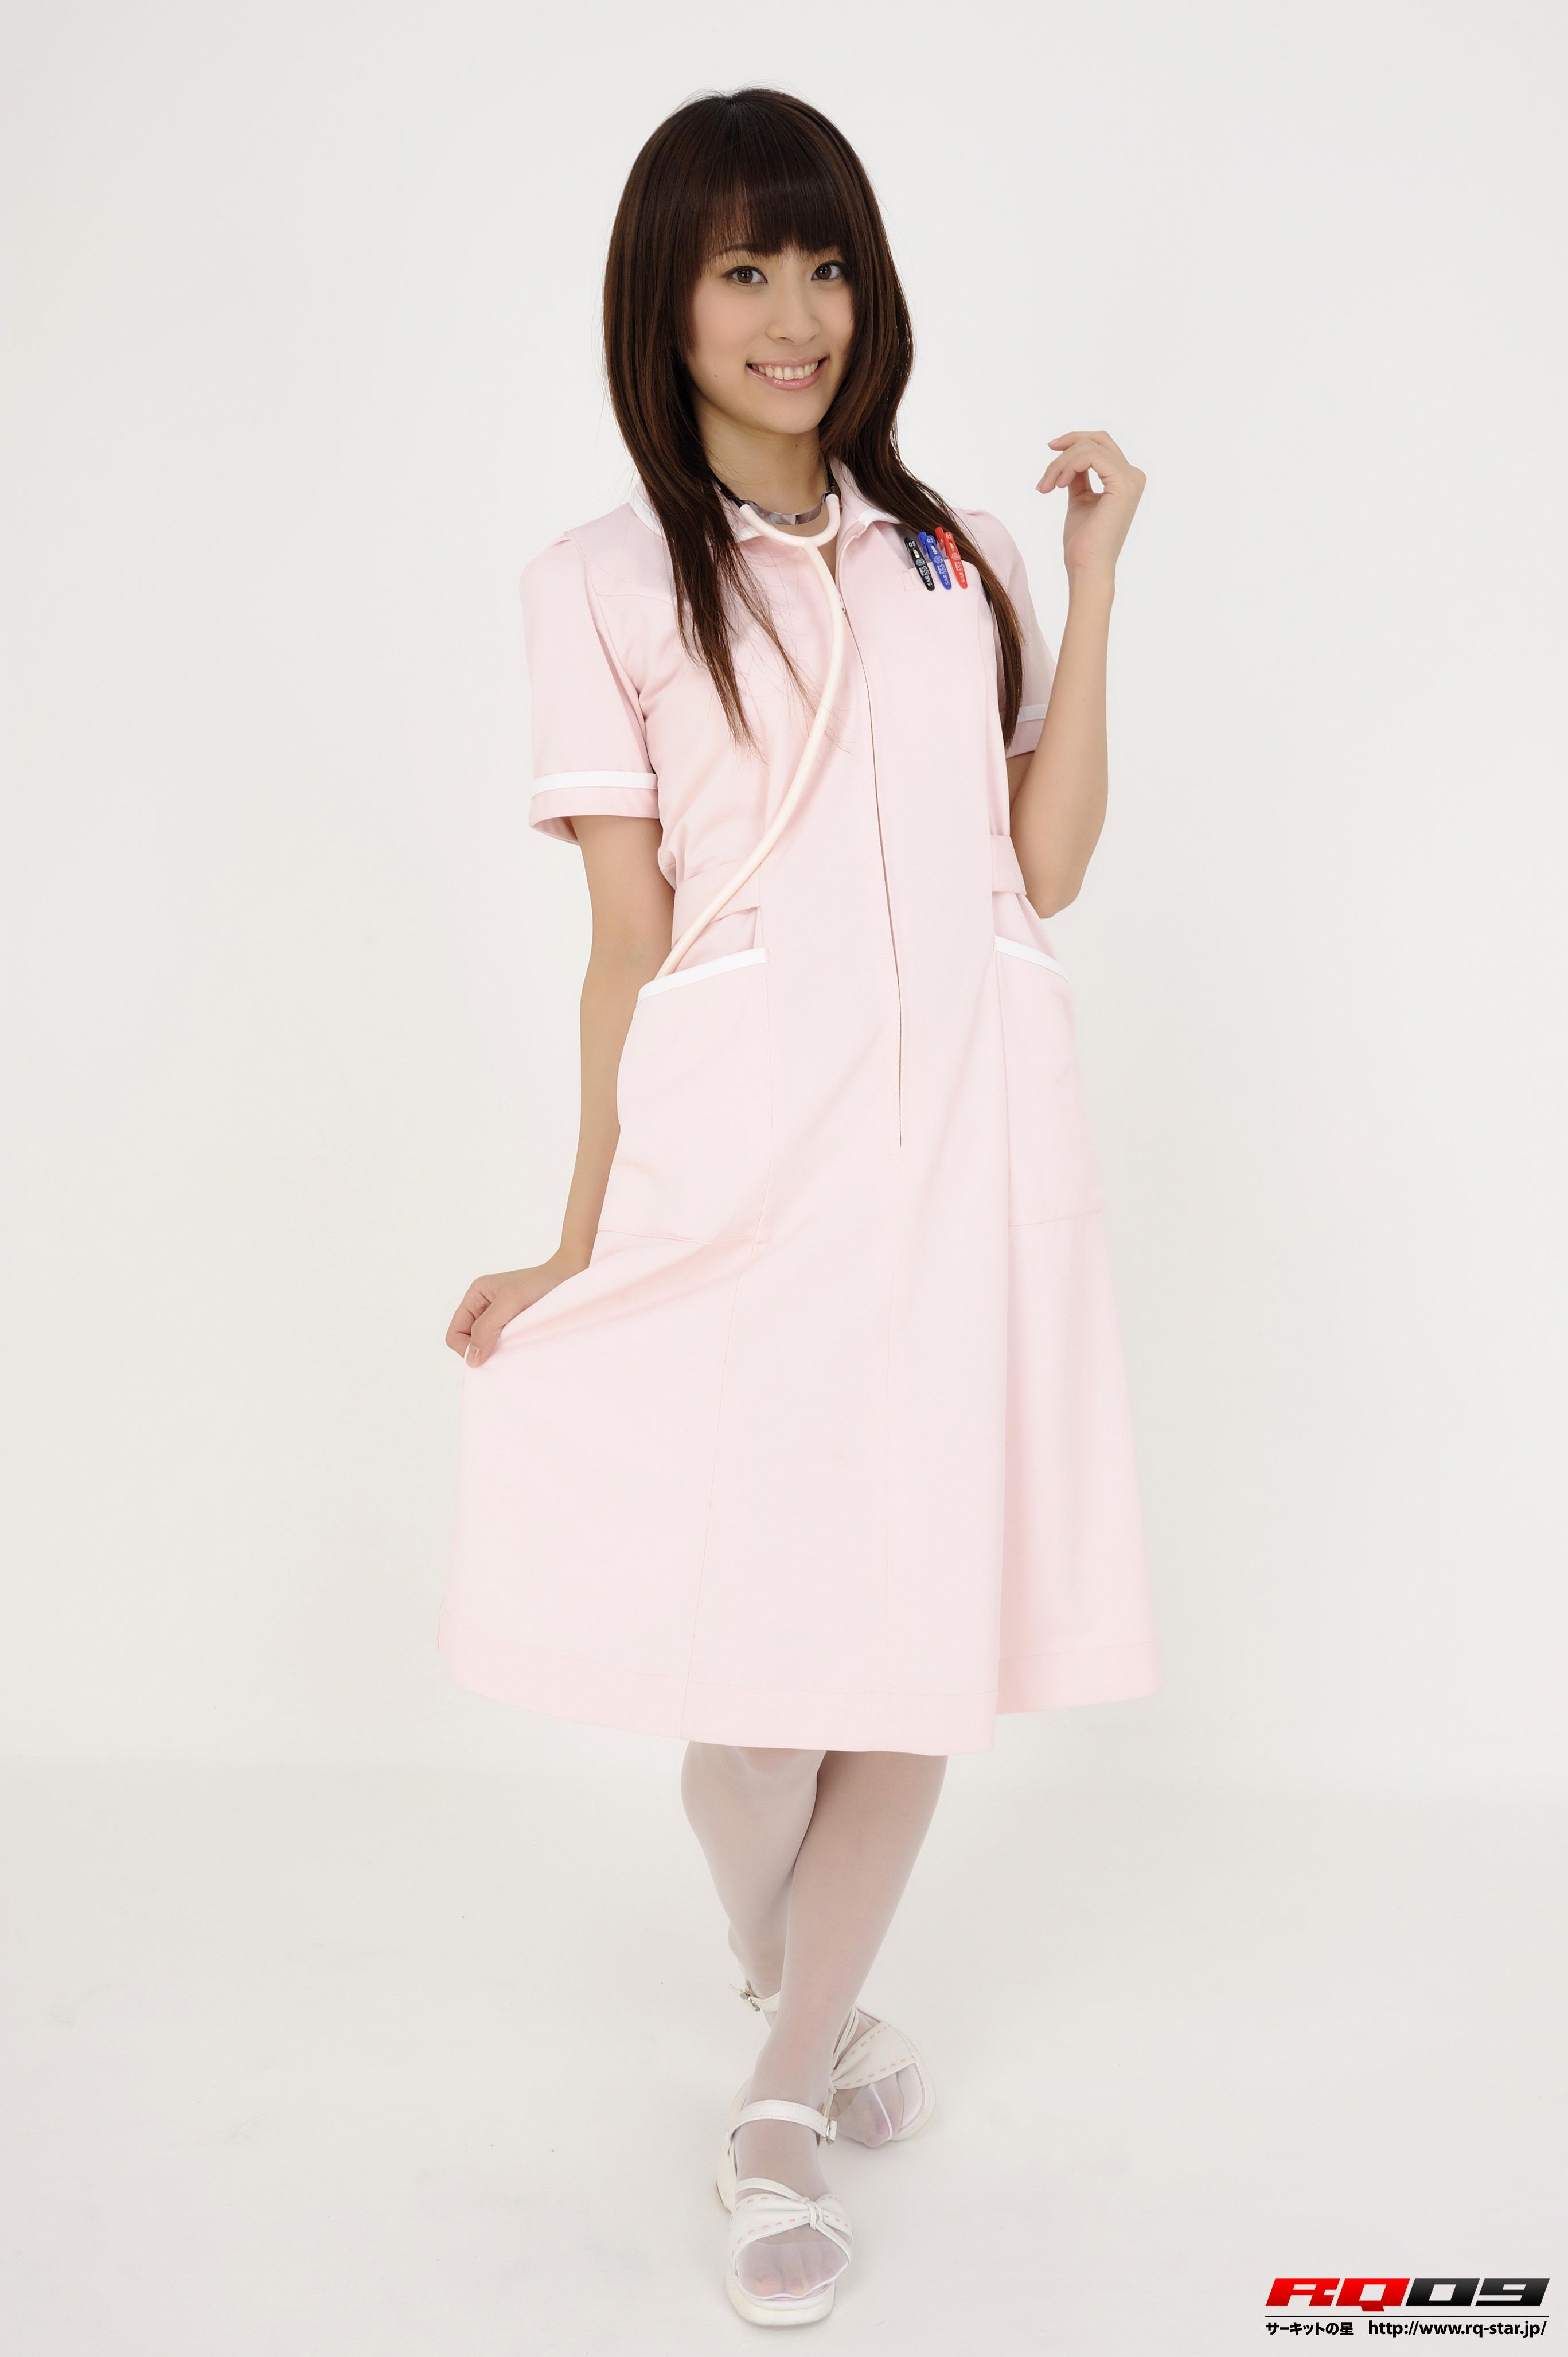 [RQ-STAR写真]NO.00148 林杏菜 Anna Hayashi 粉色性感女护士制服加粉色丝袜美腿私房写真集